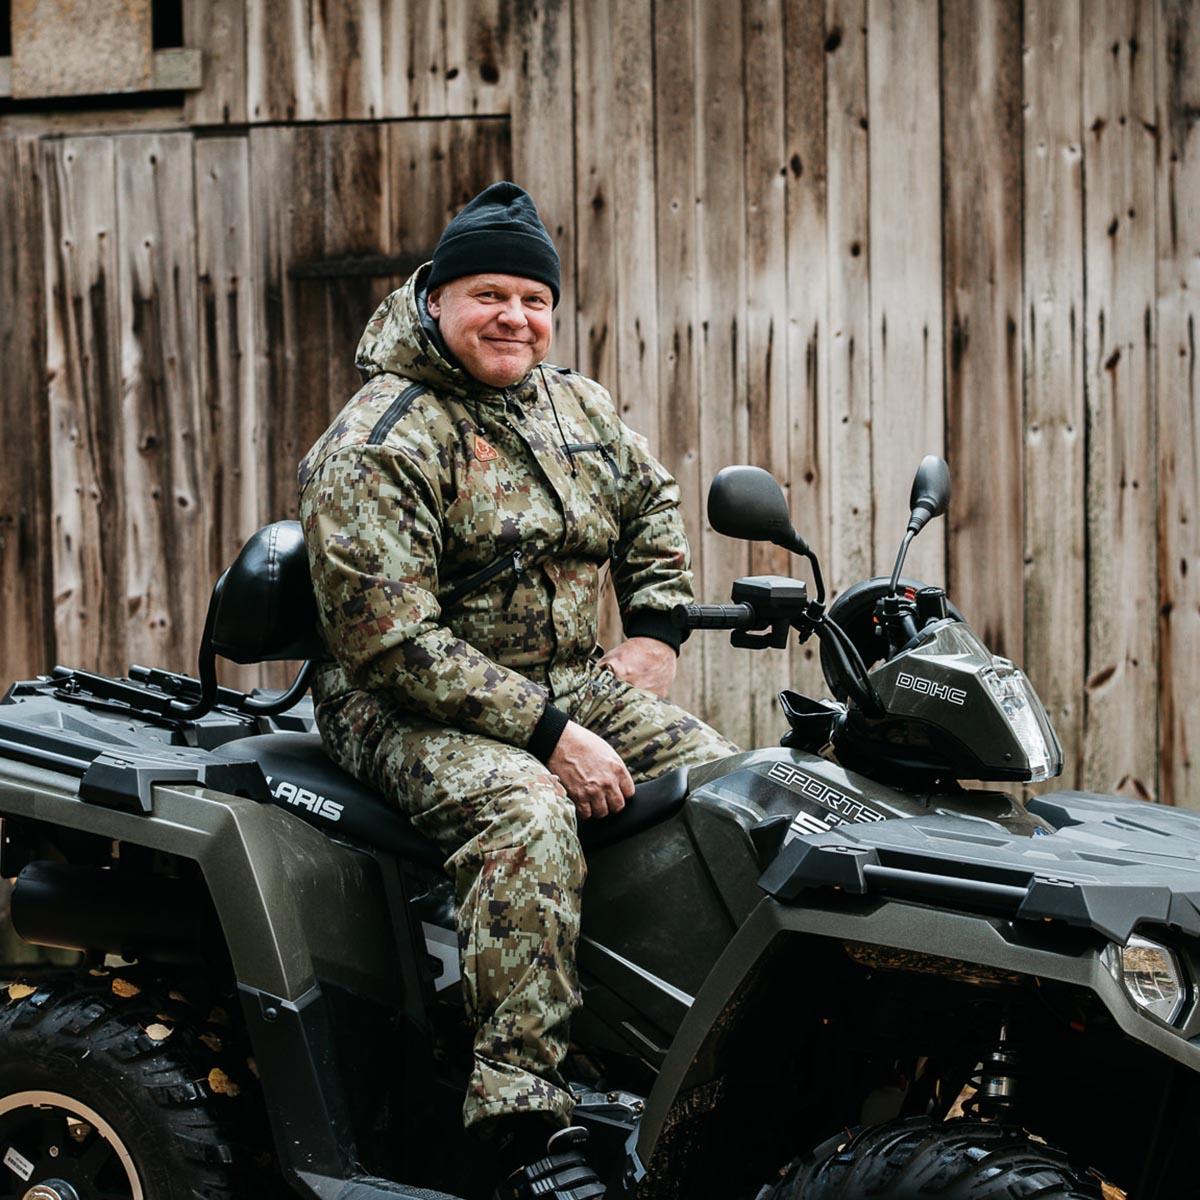 Hylje Action Camo Haalari Camouflage 7 1200x1200